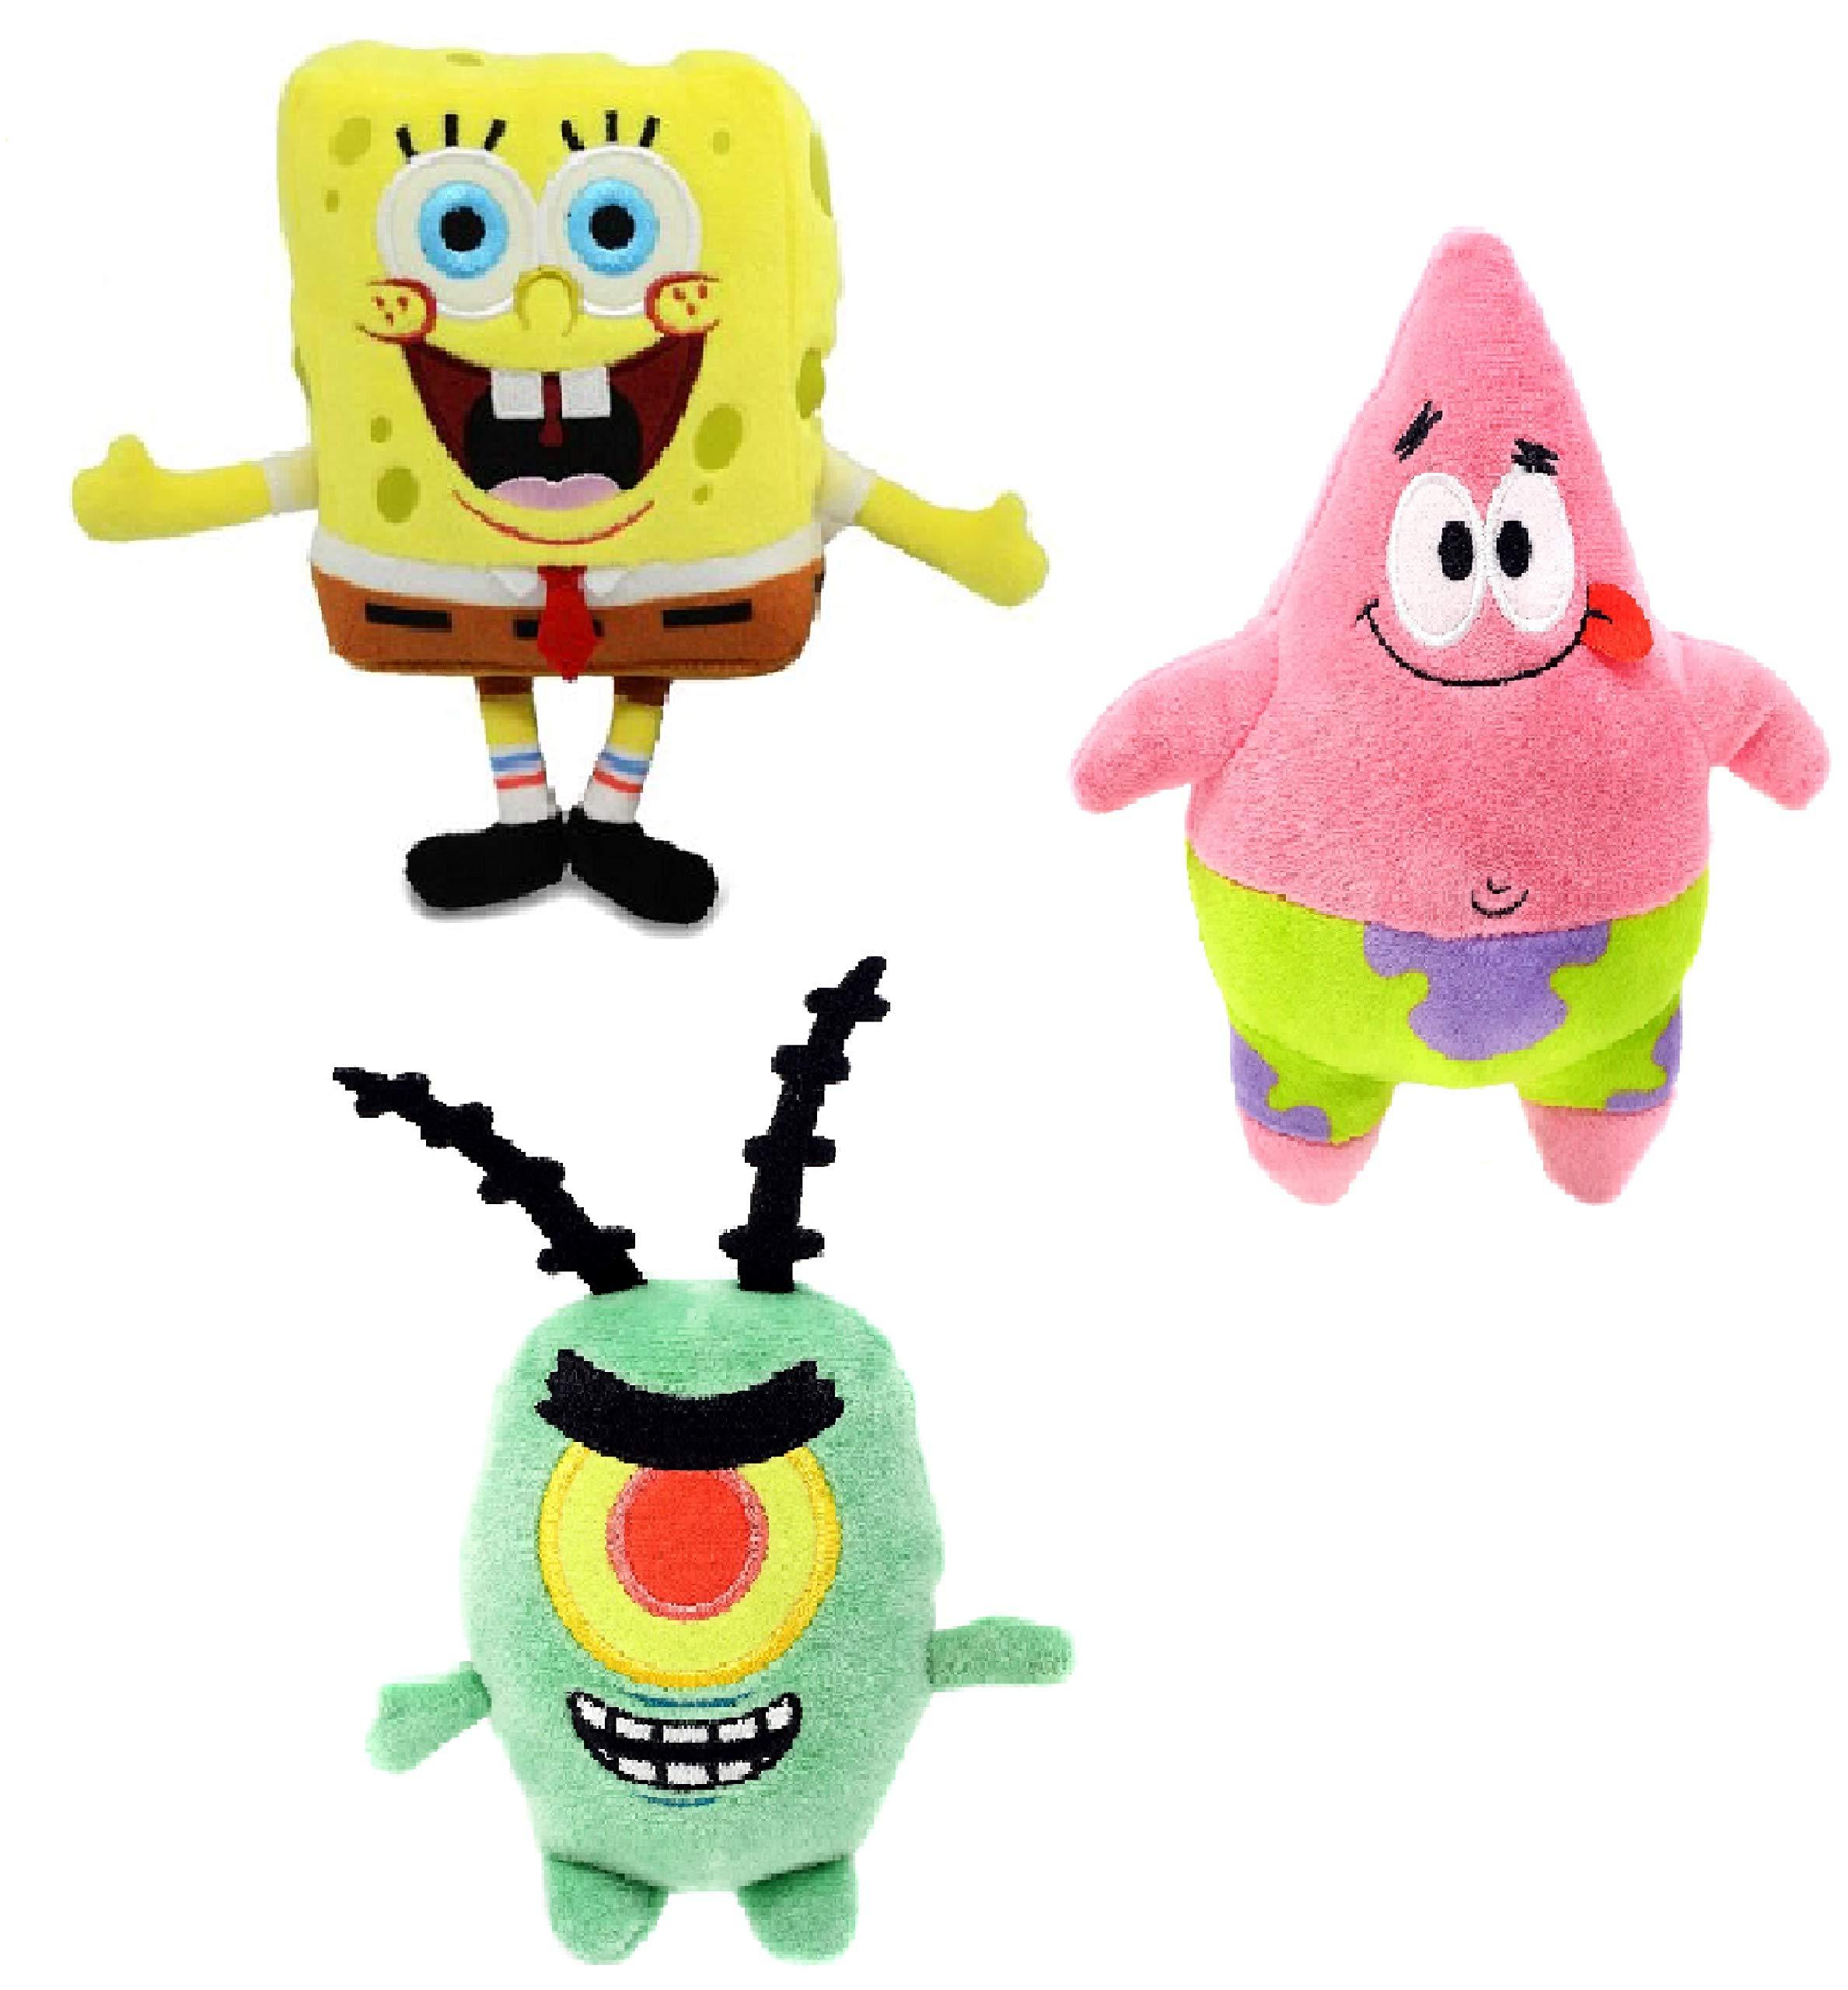 N2 Nickelodeon Spongebob Squarepants Set of 3: Mini Plush [Open Mouth],Patrick and Plankton ( 7'' Each) by N2